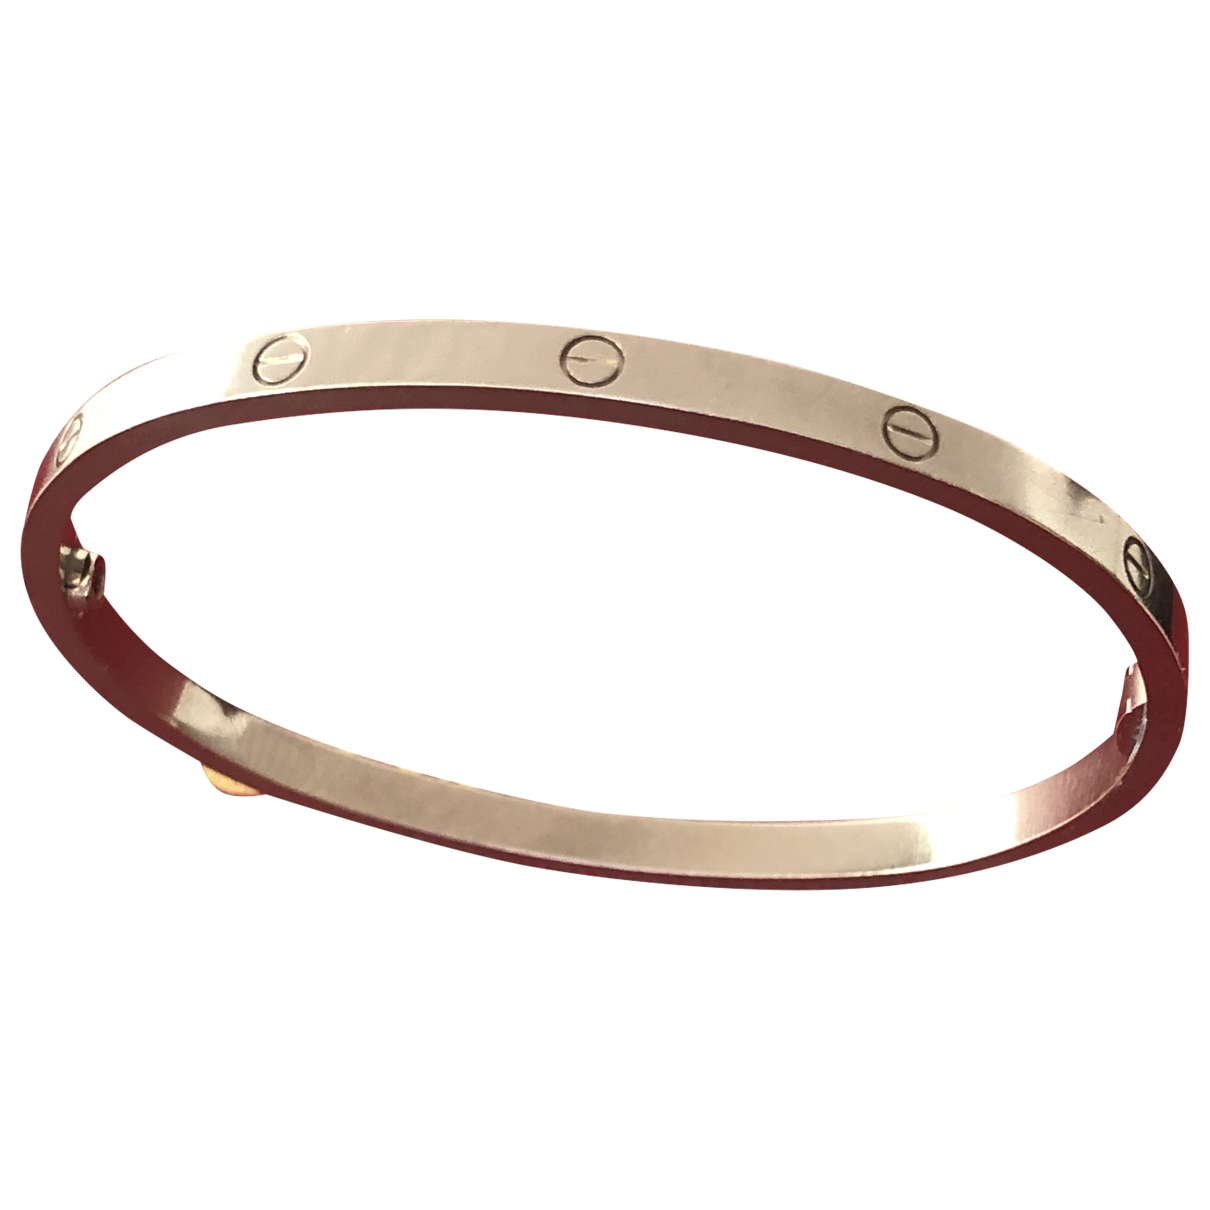 Cartier Love Armband in  Silber Weissgold